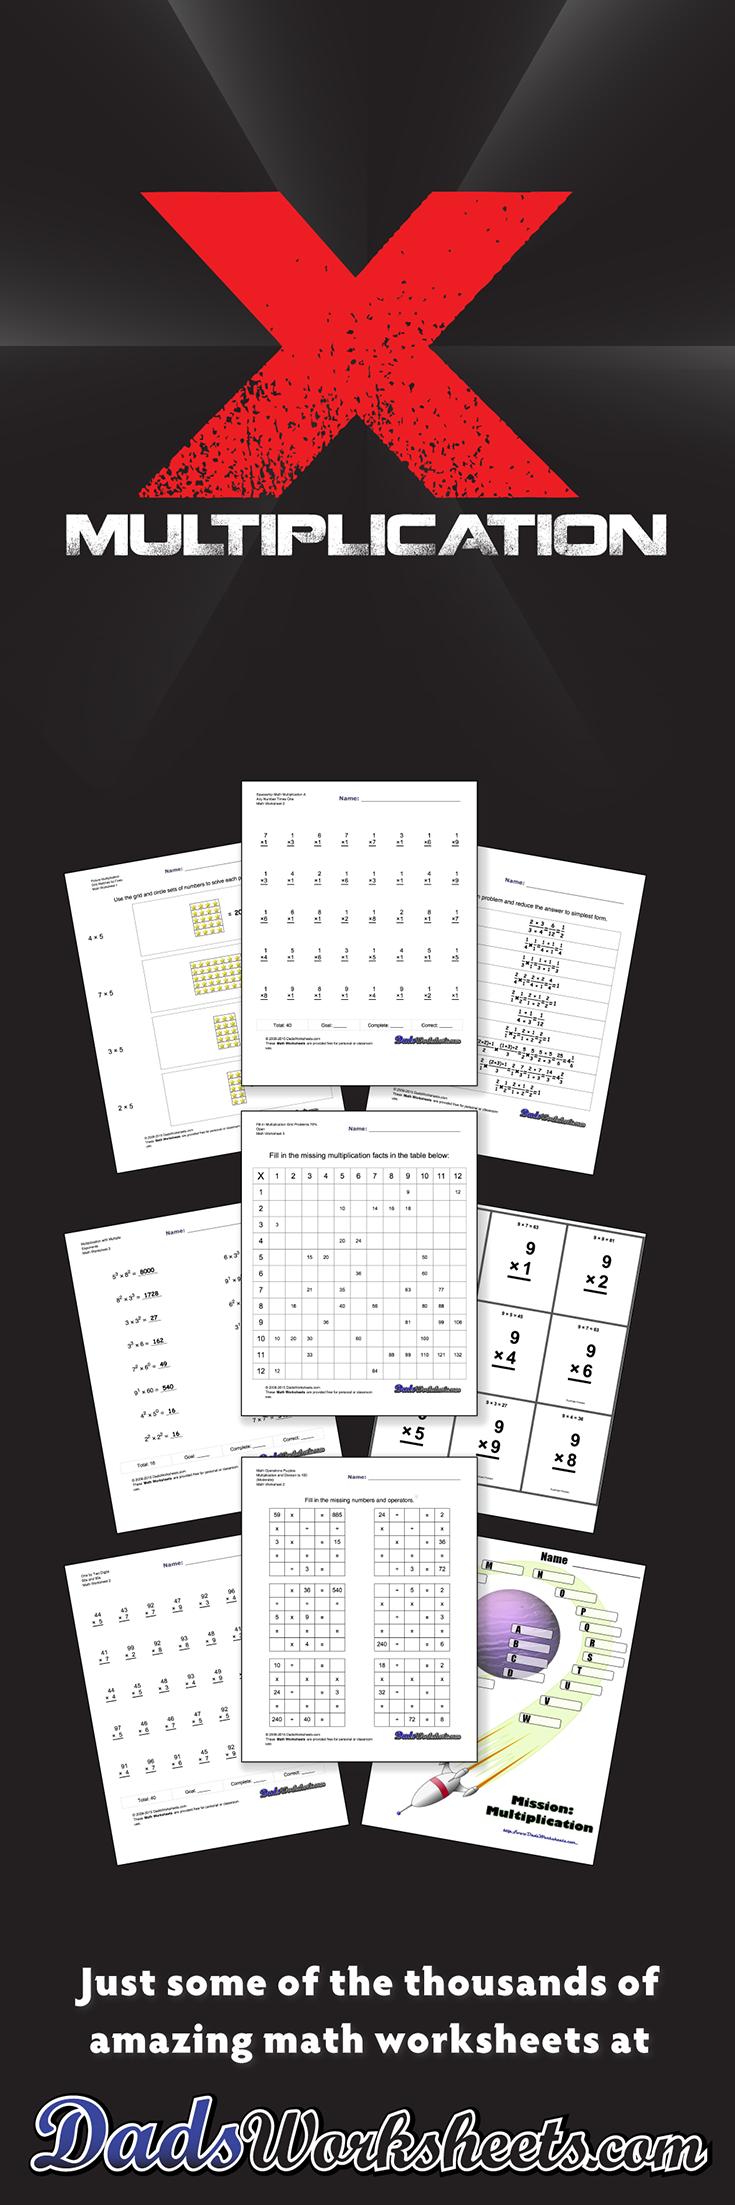 Predownload: Multiplication Worksheets Multiplication Worksheets Free Multiplication Worksheets Math Multiplication [ 2205 x 735 Pixel ]